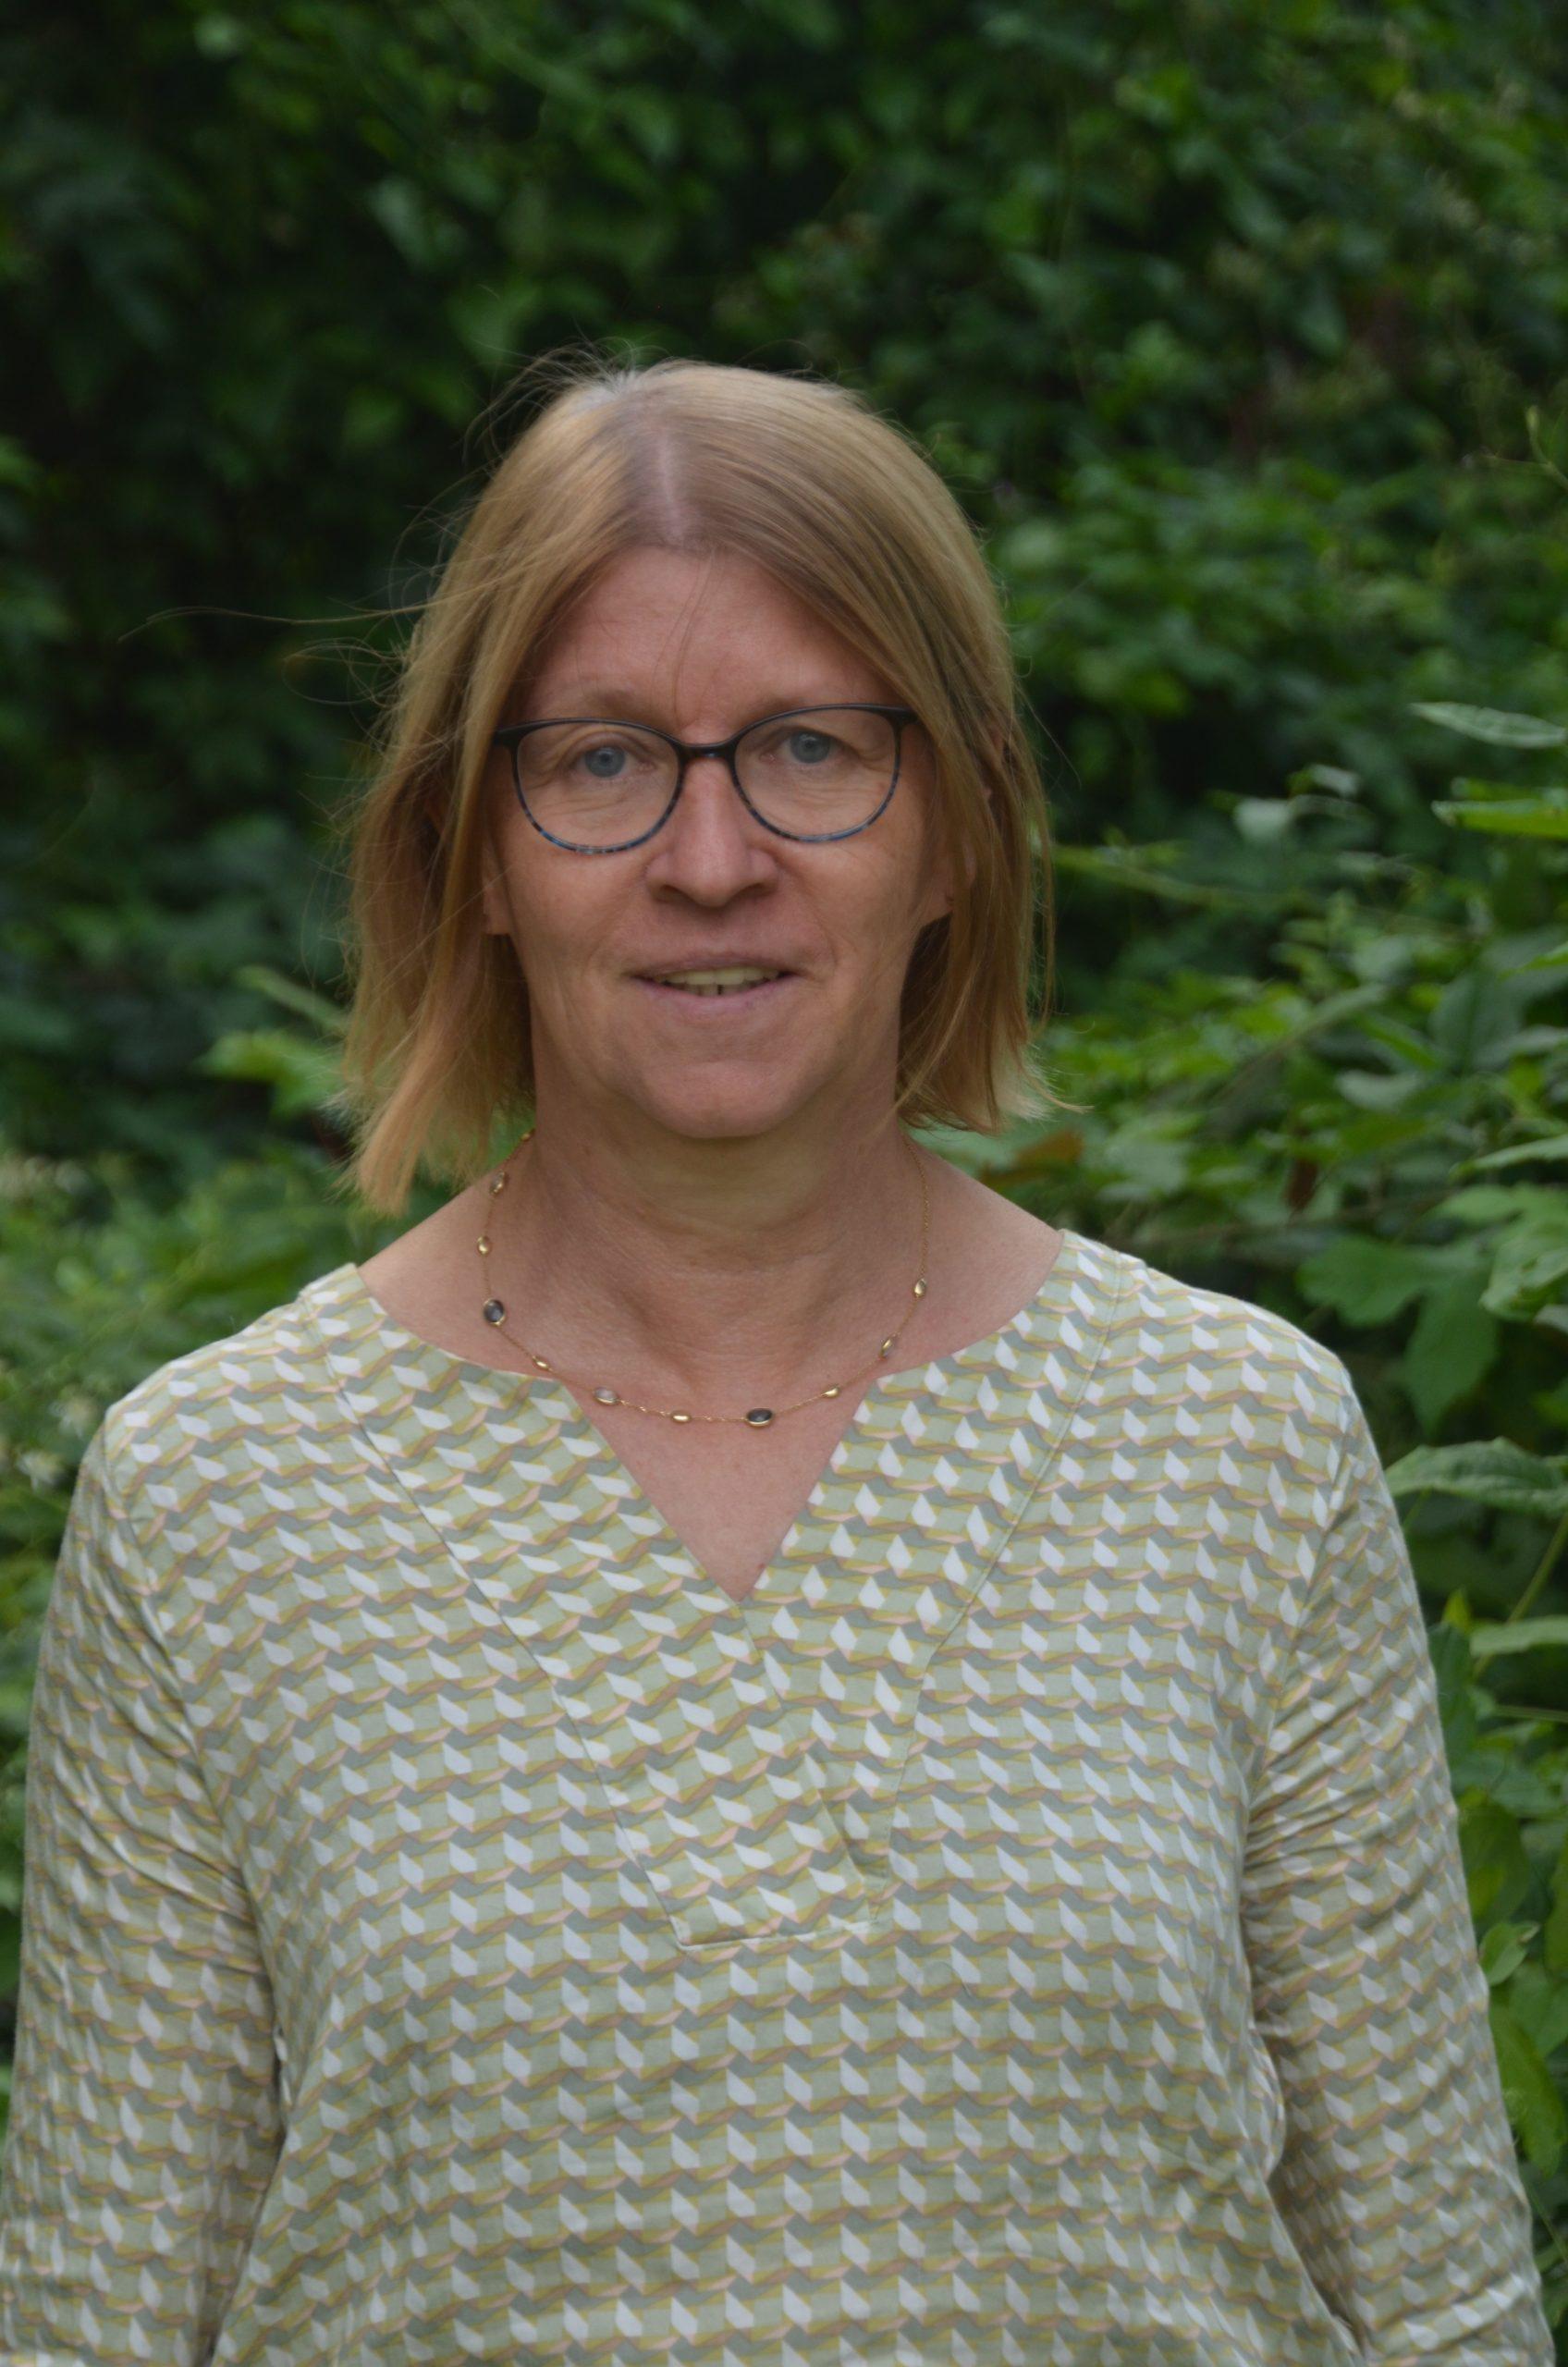 Frau Preuss